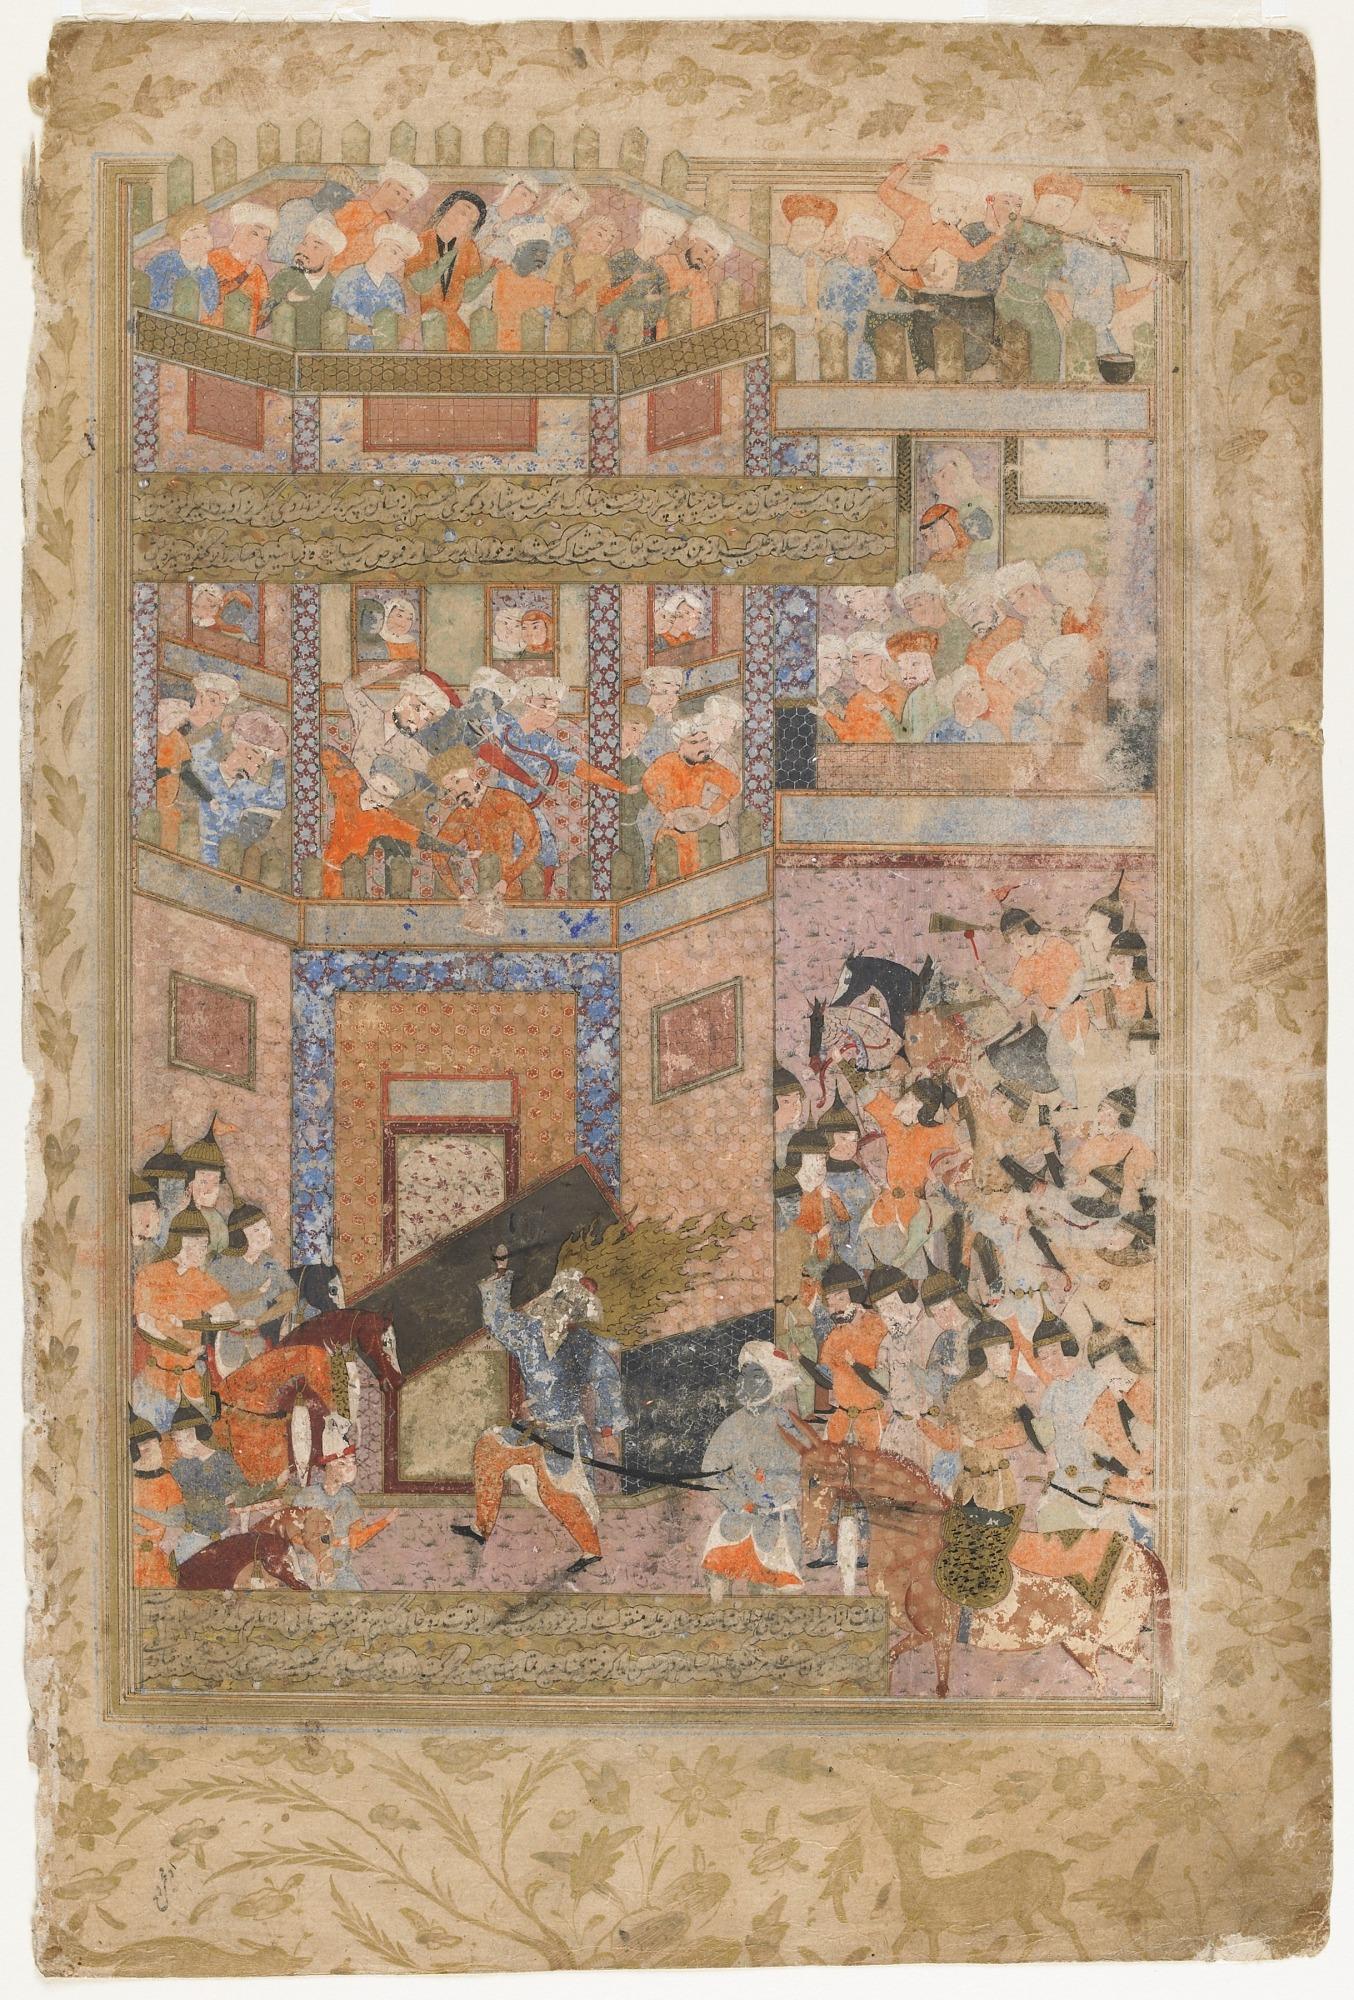 Folio from a Rawdat al-safa (Garden of felicity) by Mirkhwand (d. 1498); recto: illuminated text; verso: Ali lifts the gates of Qamus